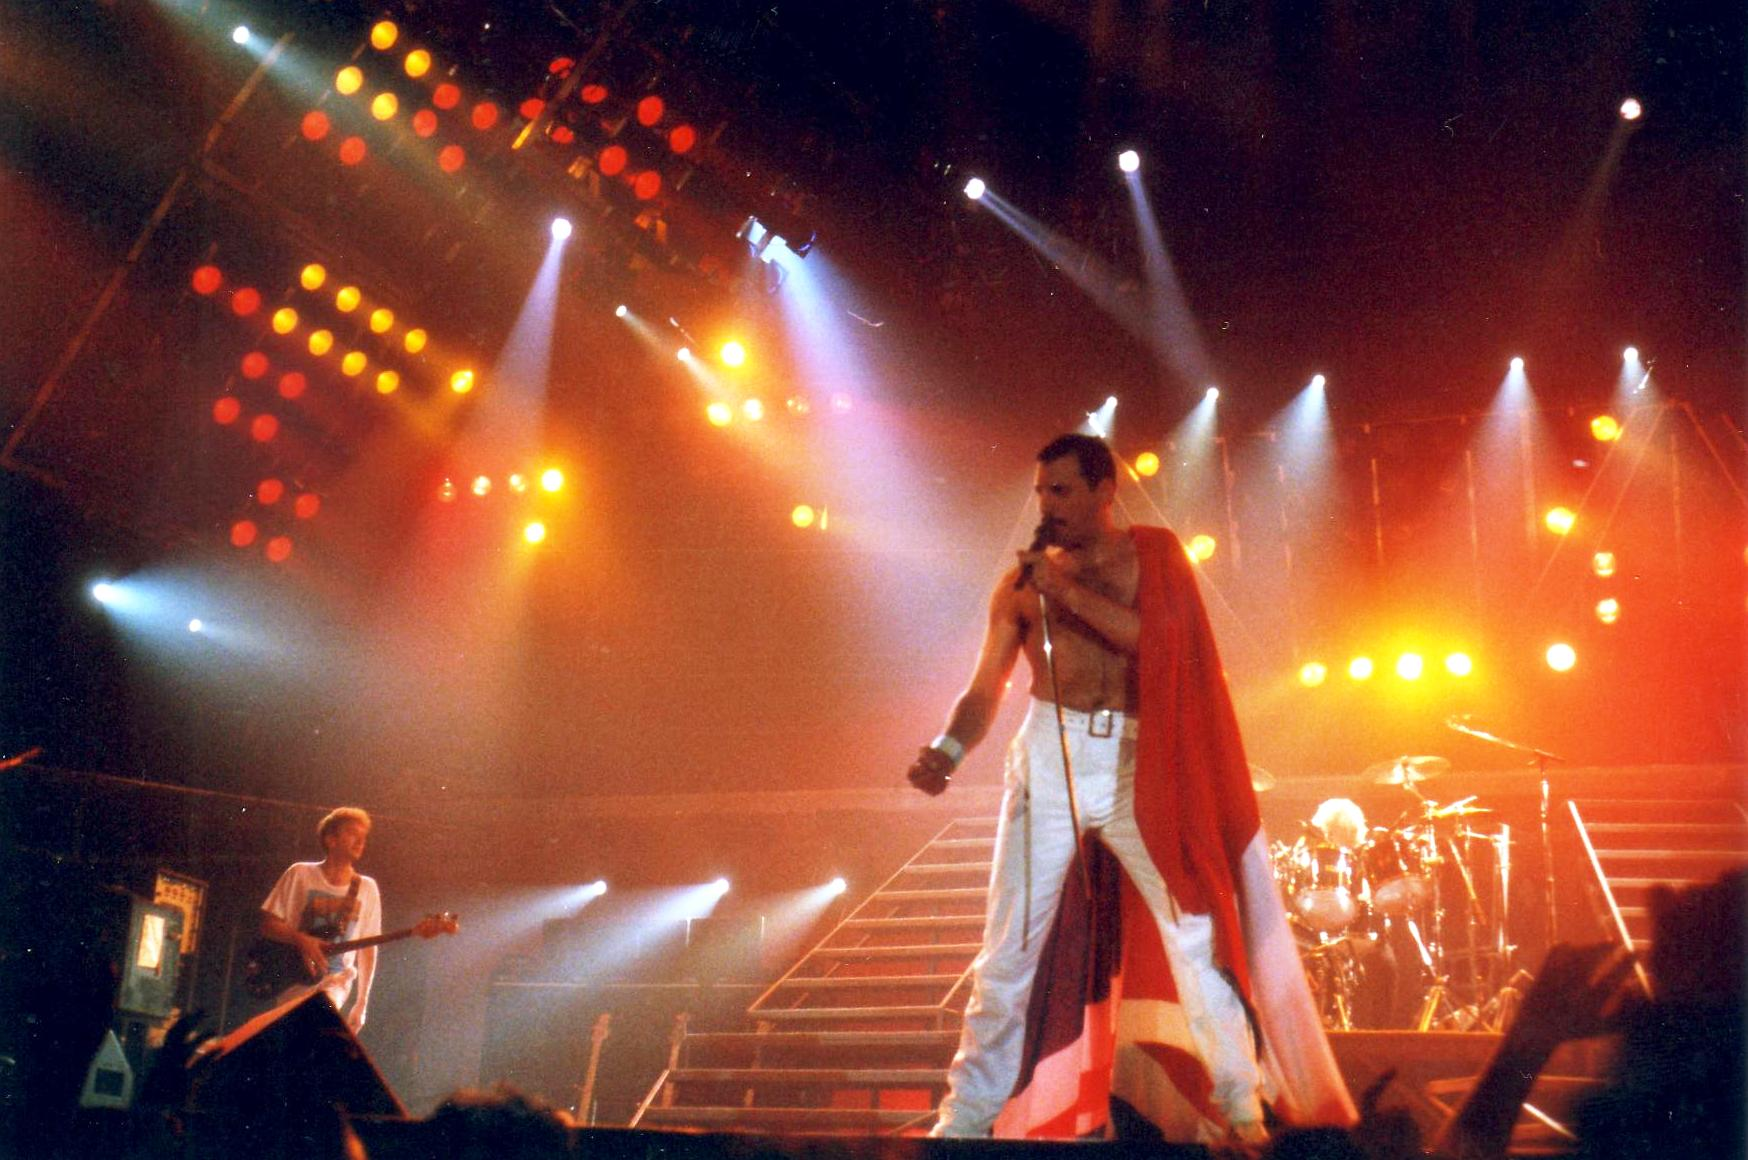 Love Magic Hd Live Wallpaper June 19 1986